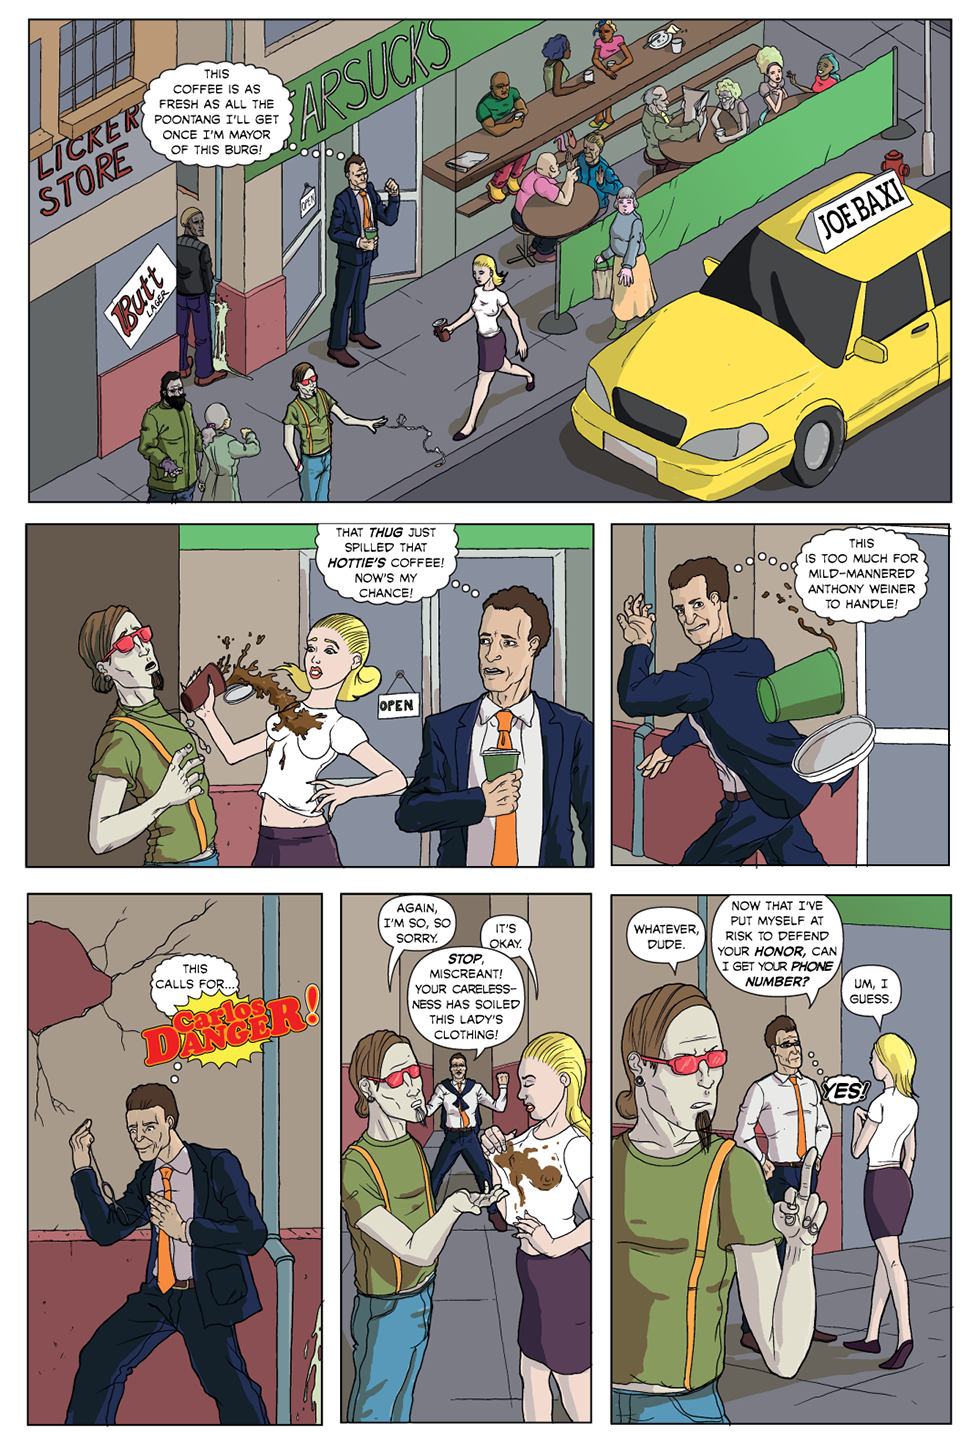 Carlos Danger #1, page 2